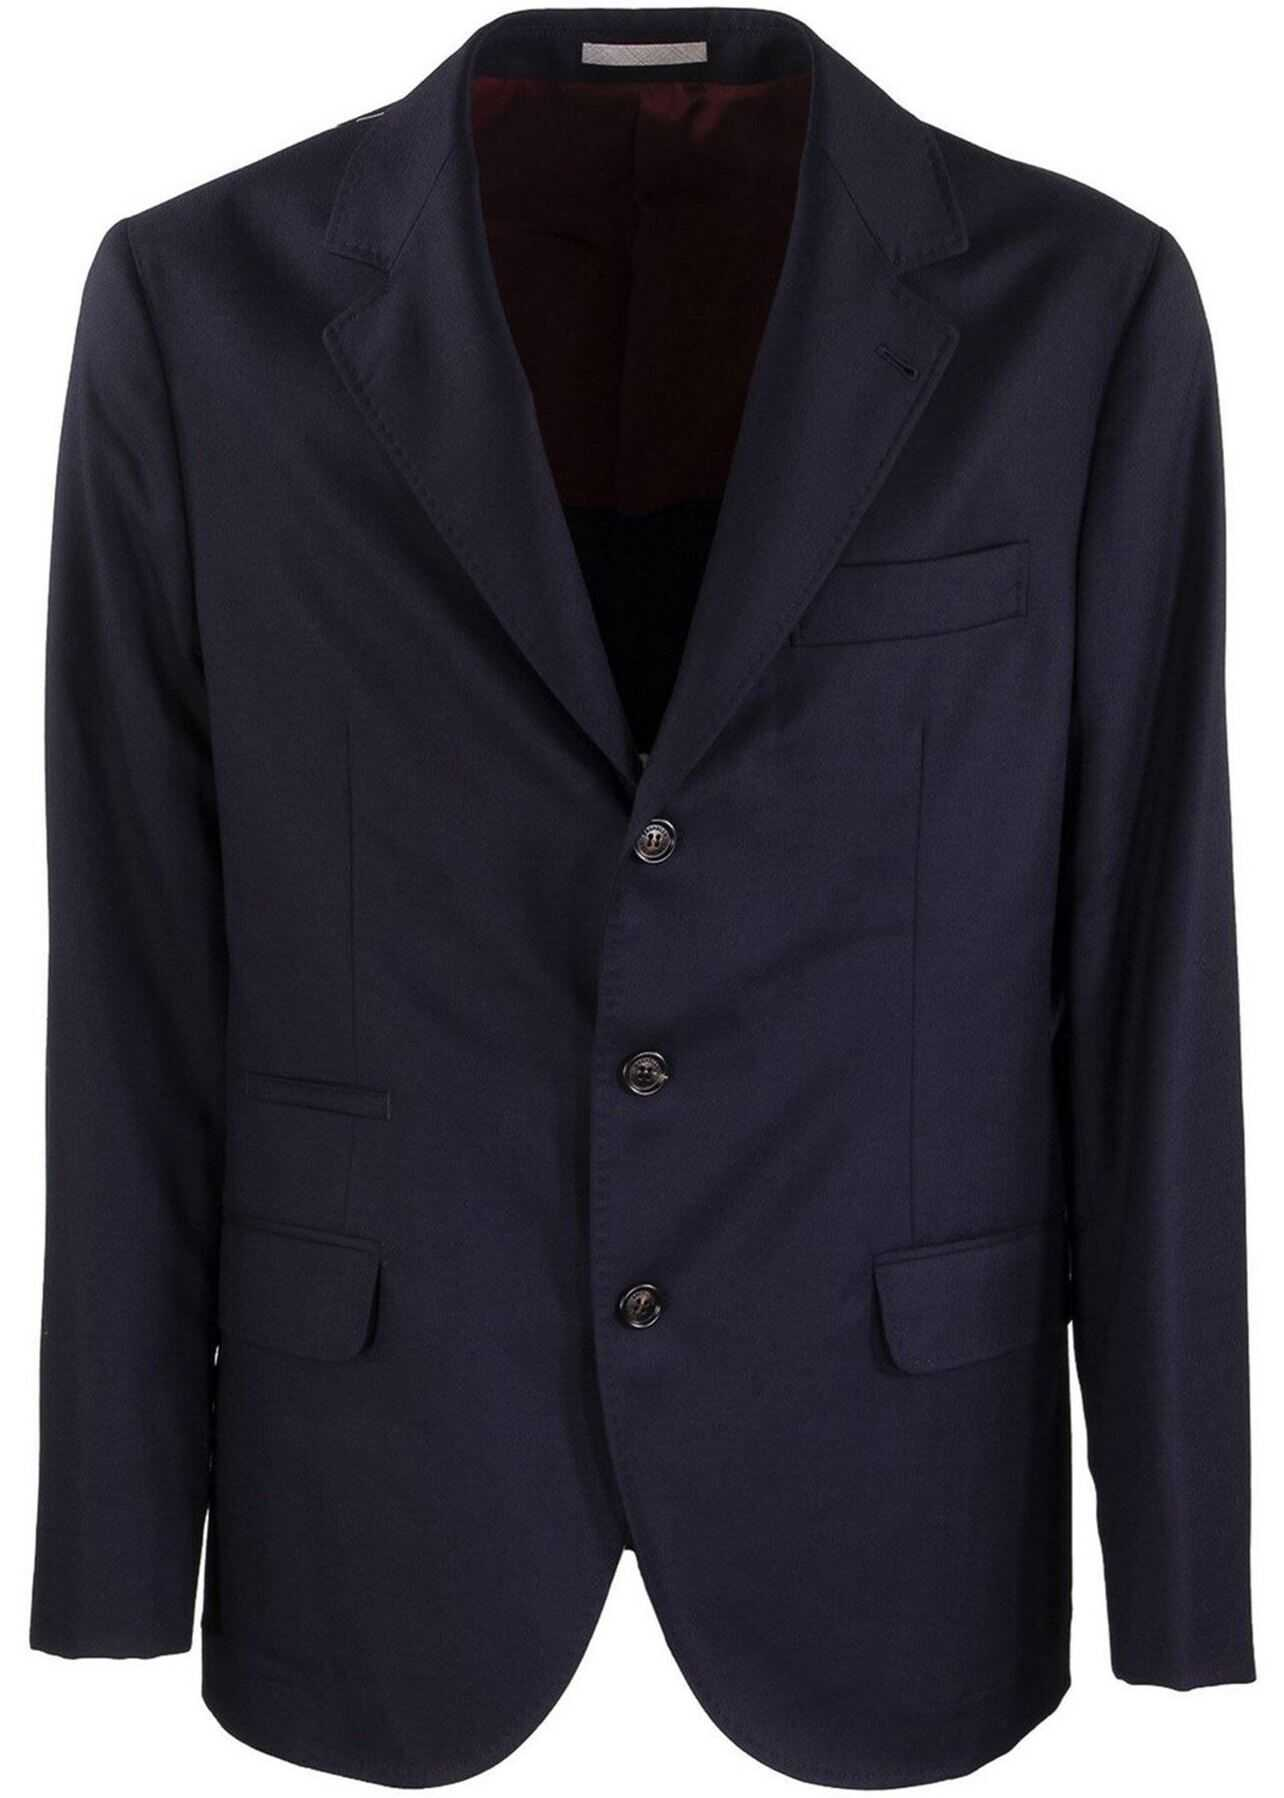 Brunello Cucinelli Single-Breasted Blue Wool Blazer Blue imagine